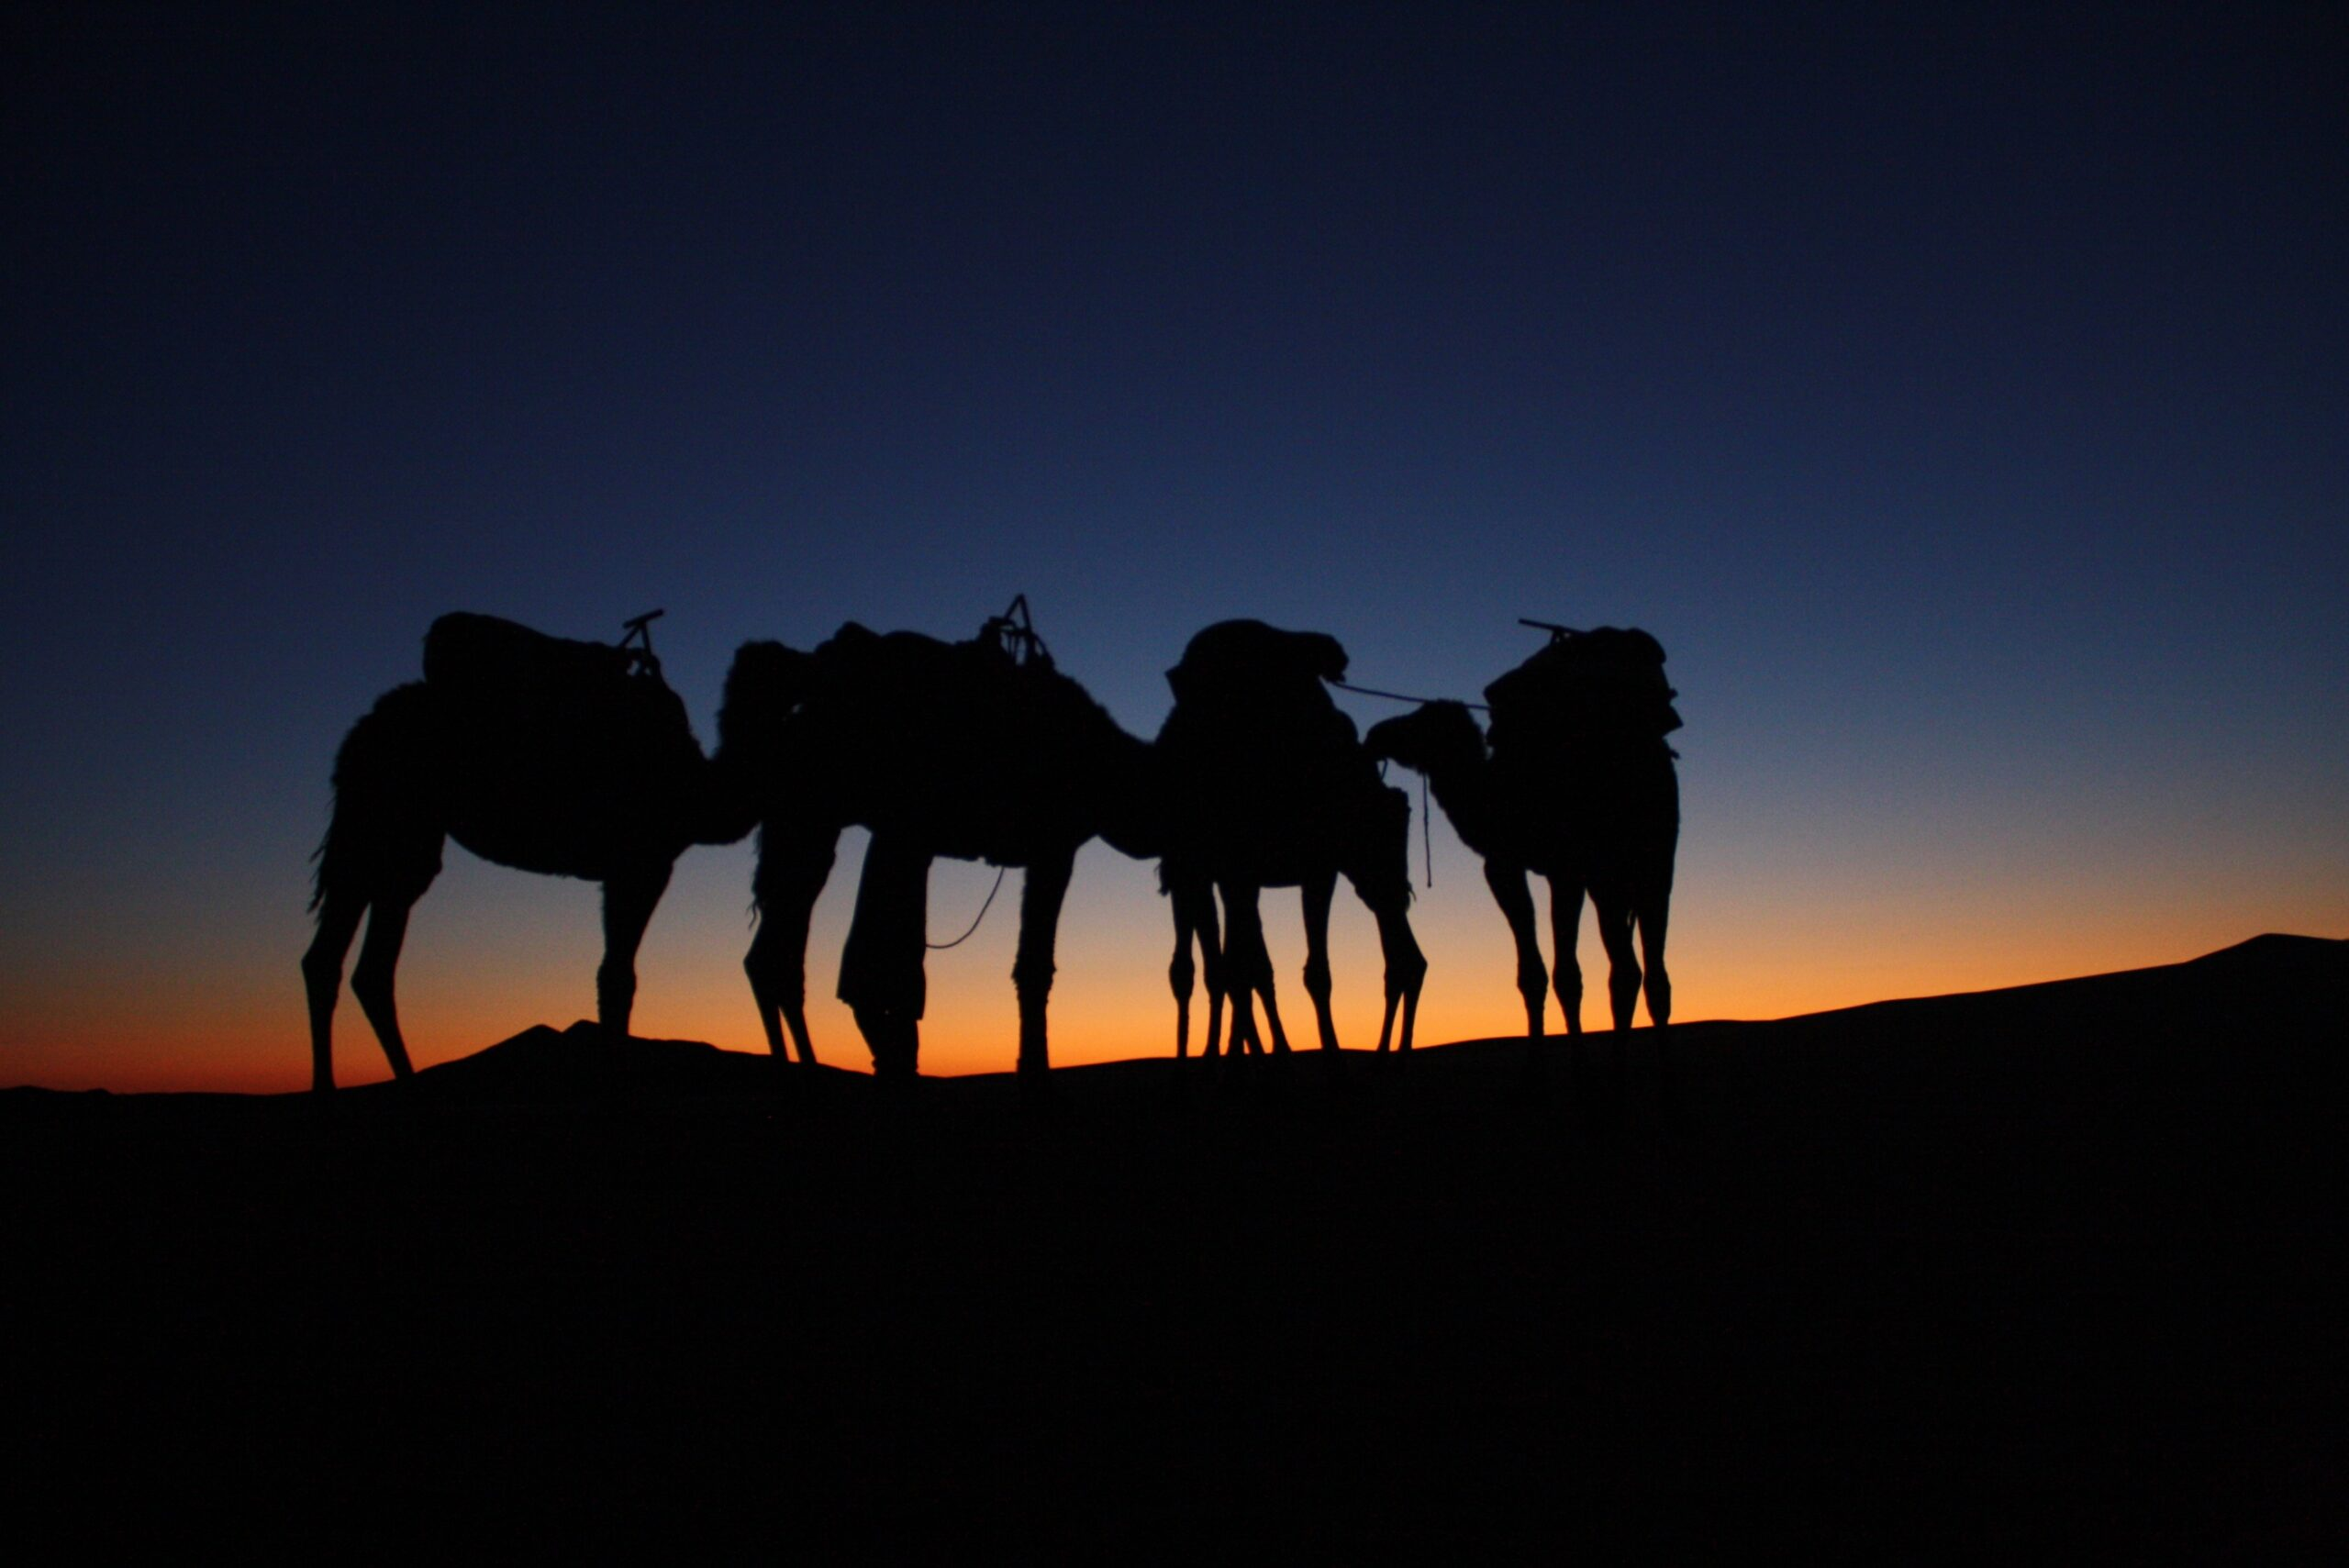 camelback safari atop a sand dune illuminated by the setting sun below them.